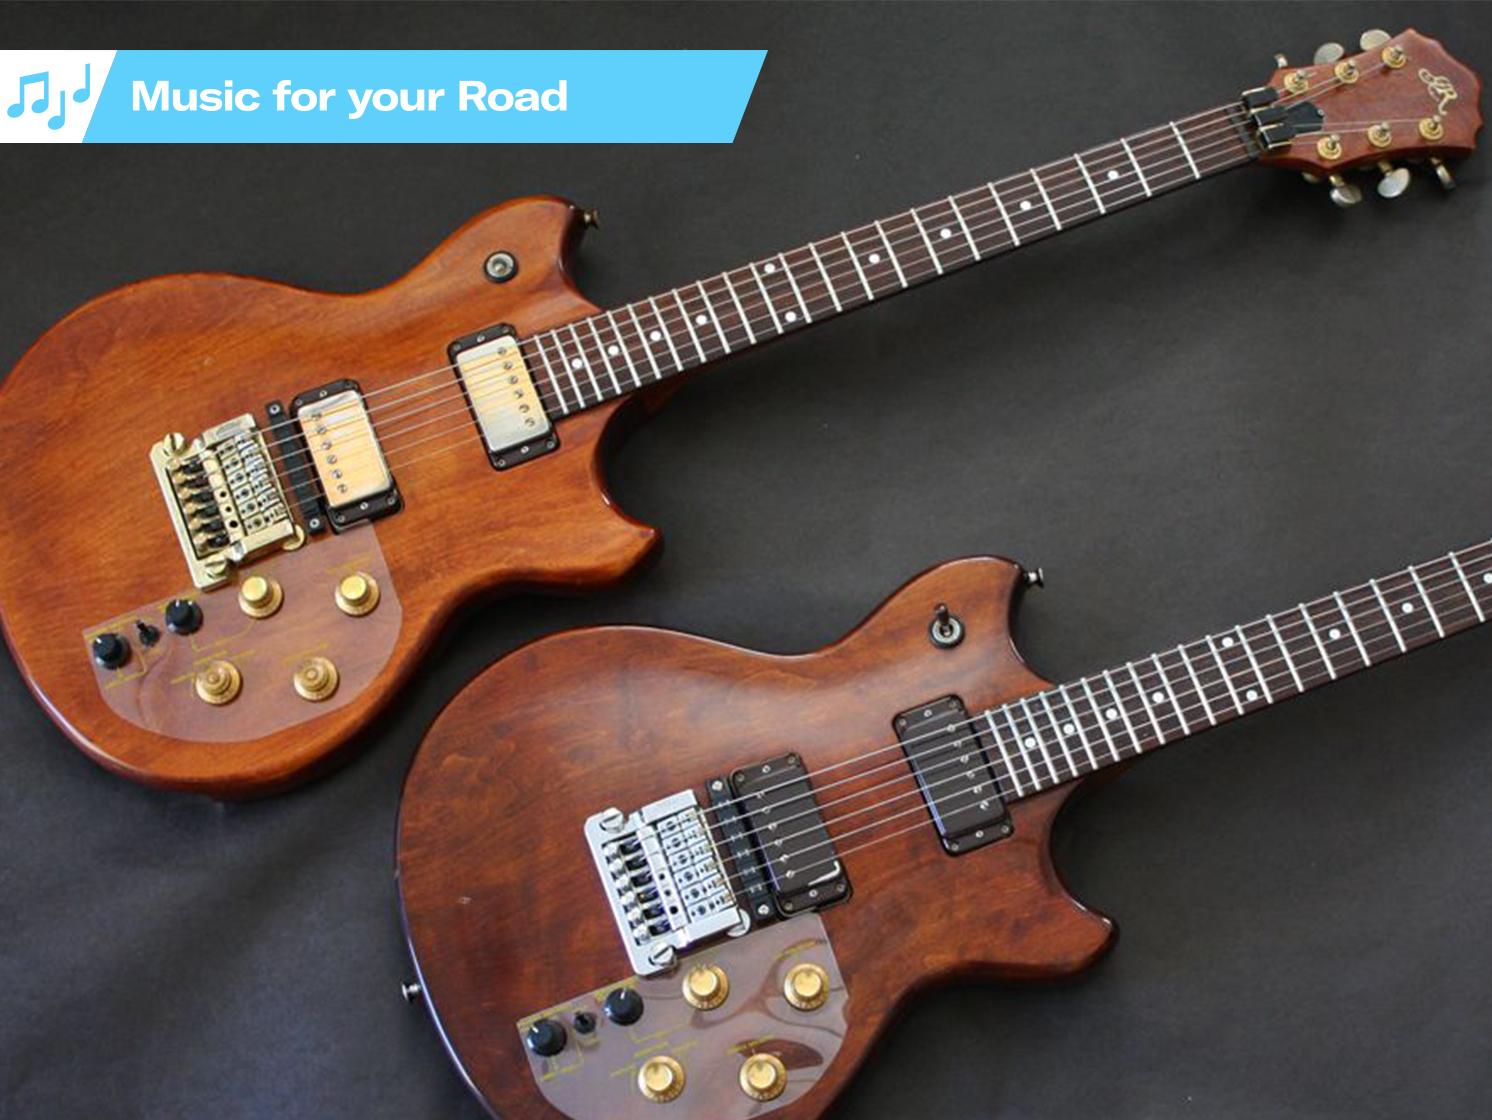 Music_For_Your_Road_Guitars_Lede